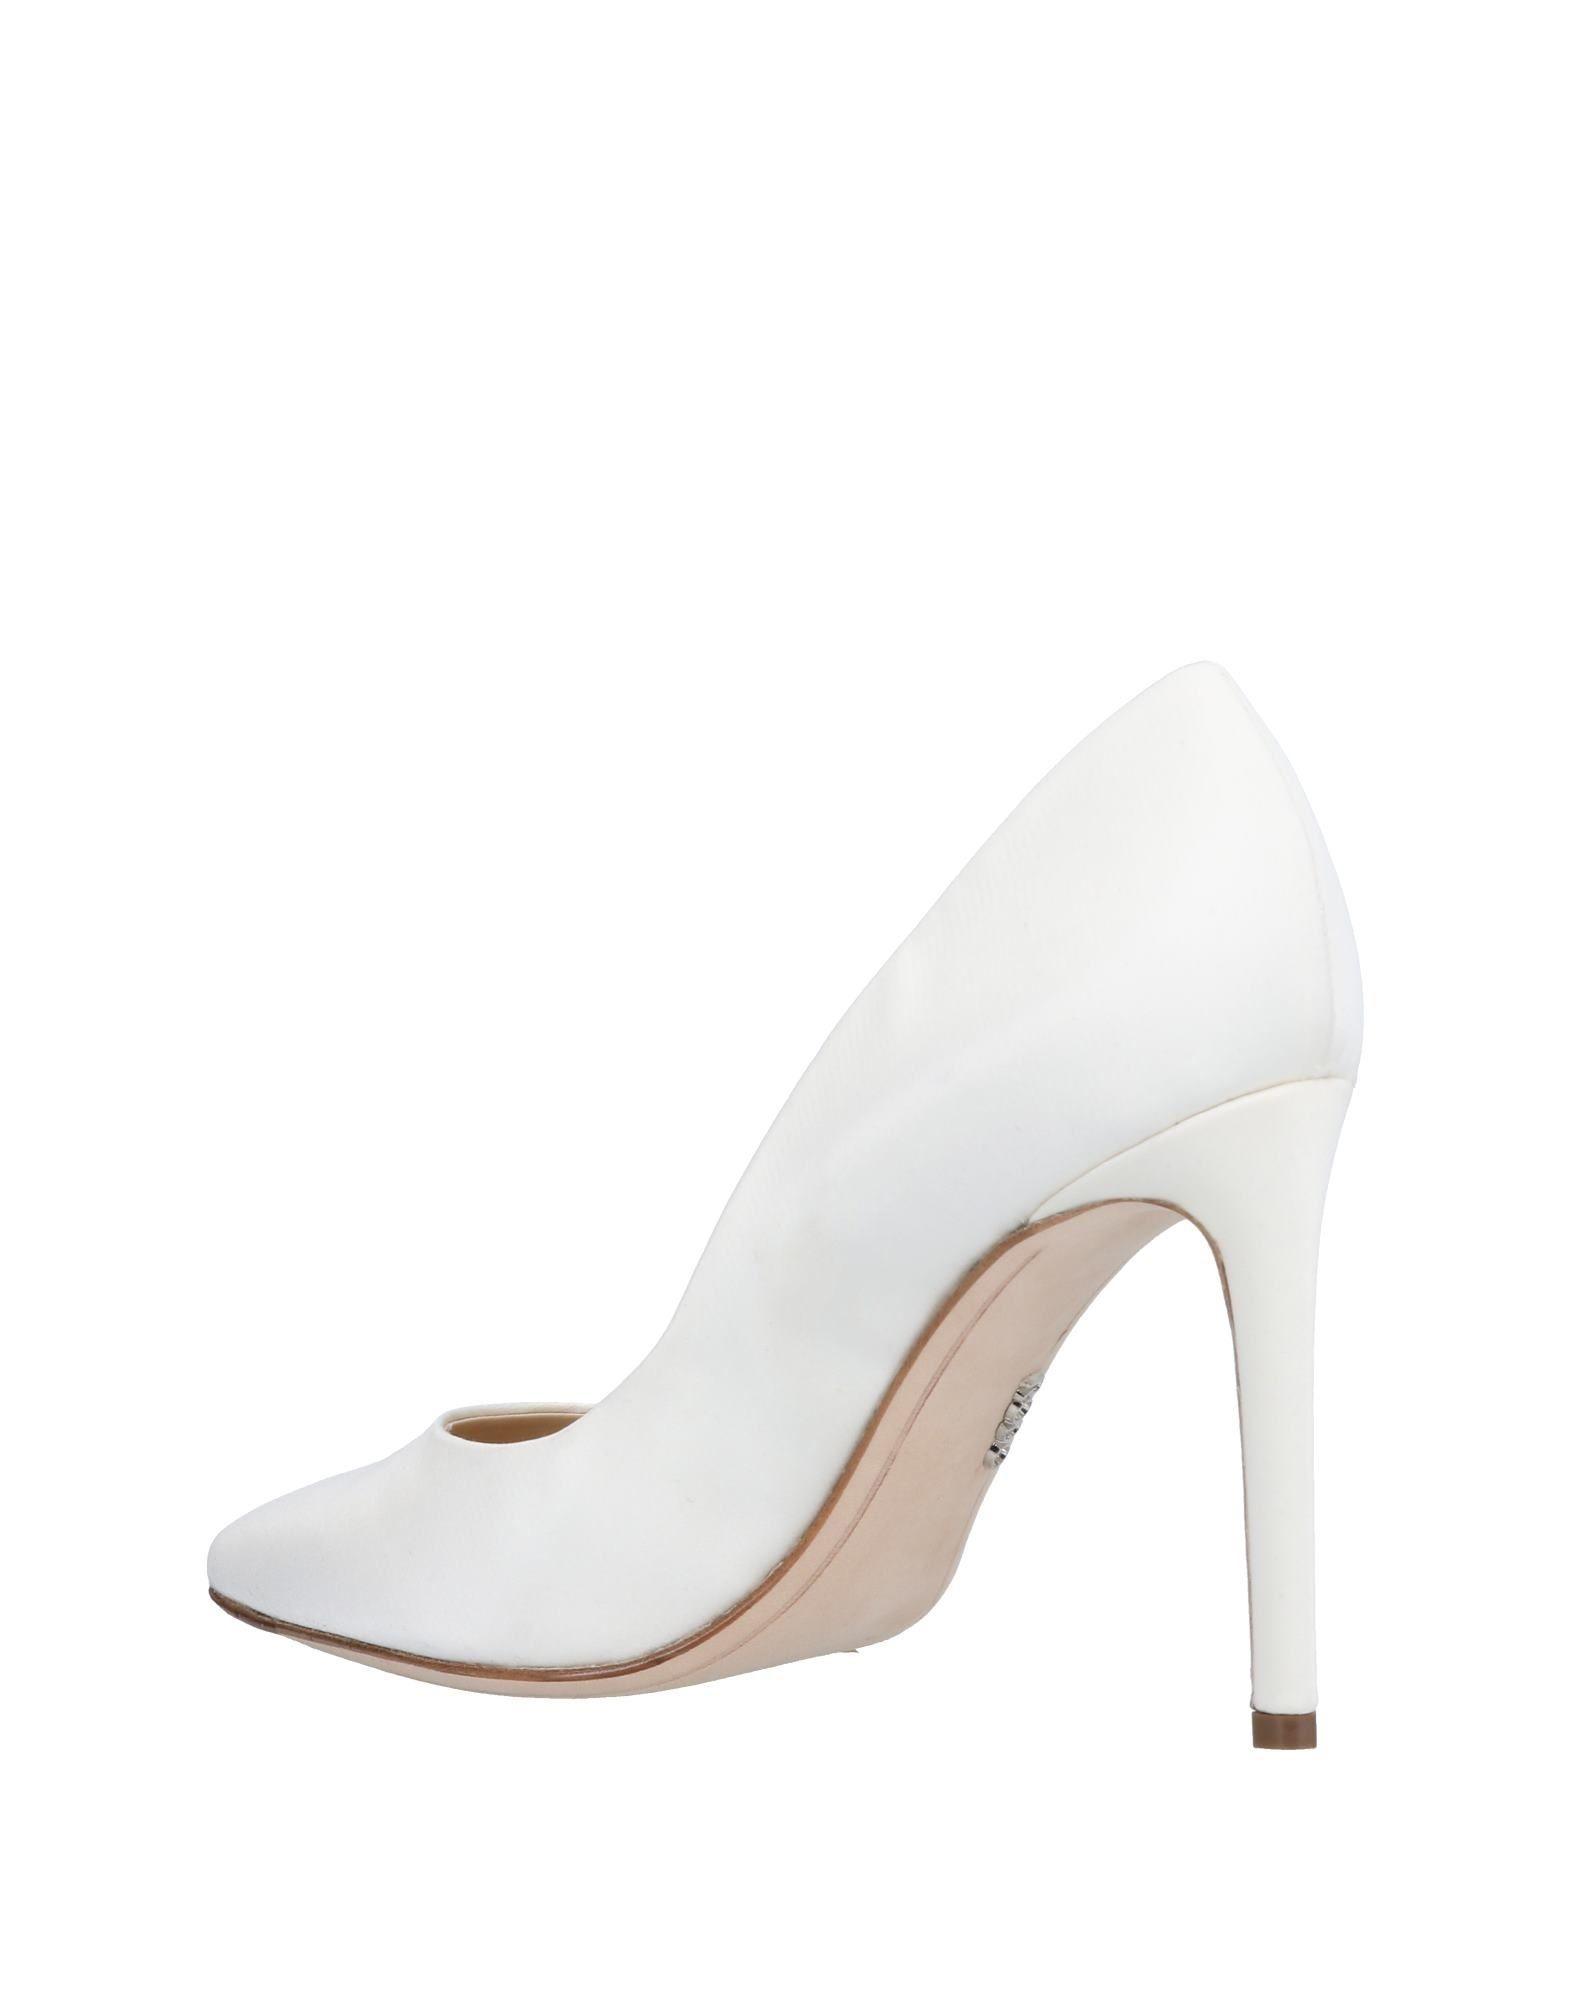 Rodo Ivory Court Shoe Heels